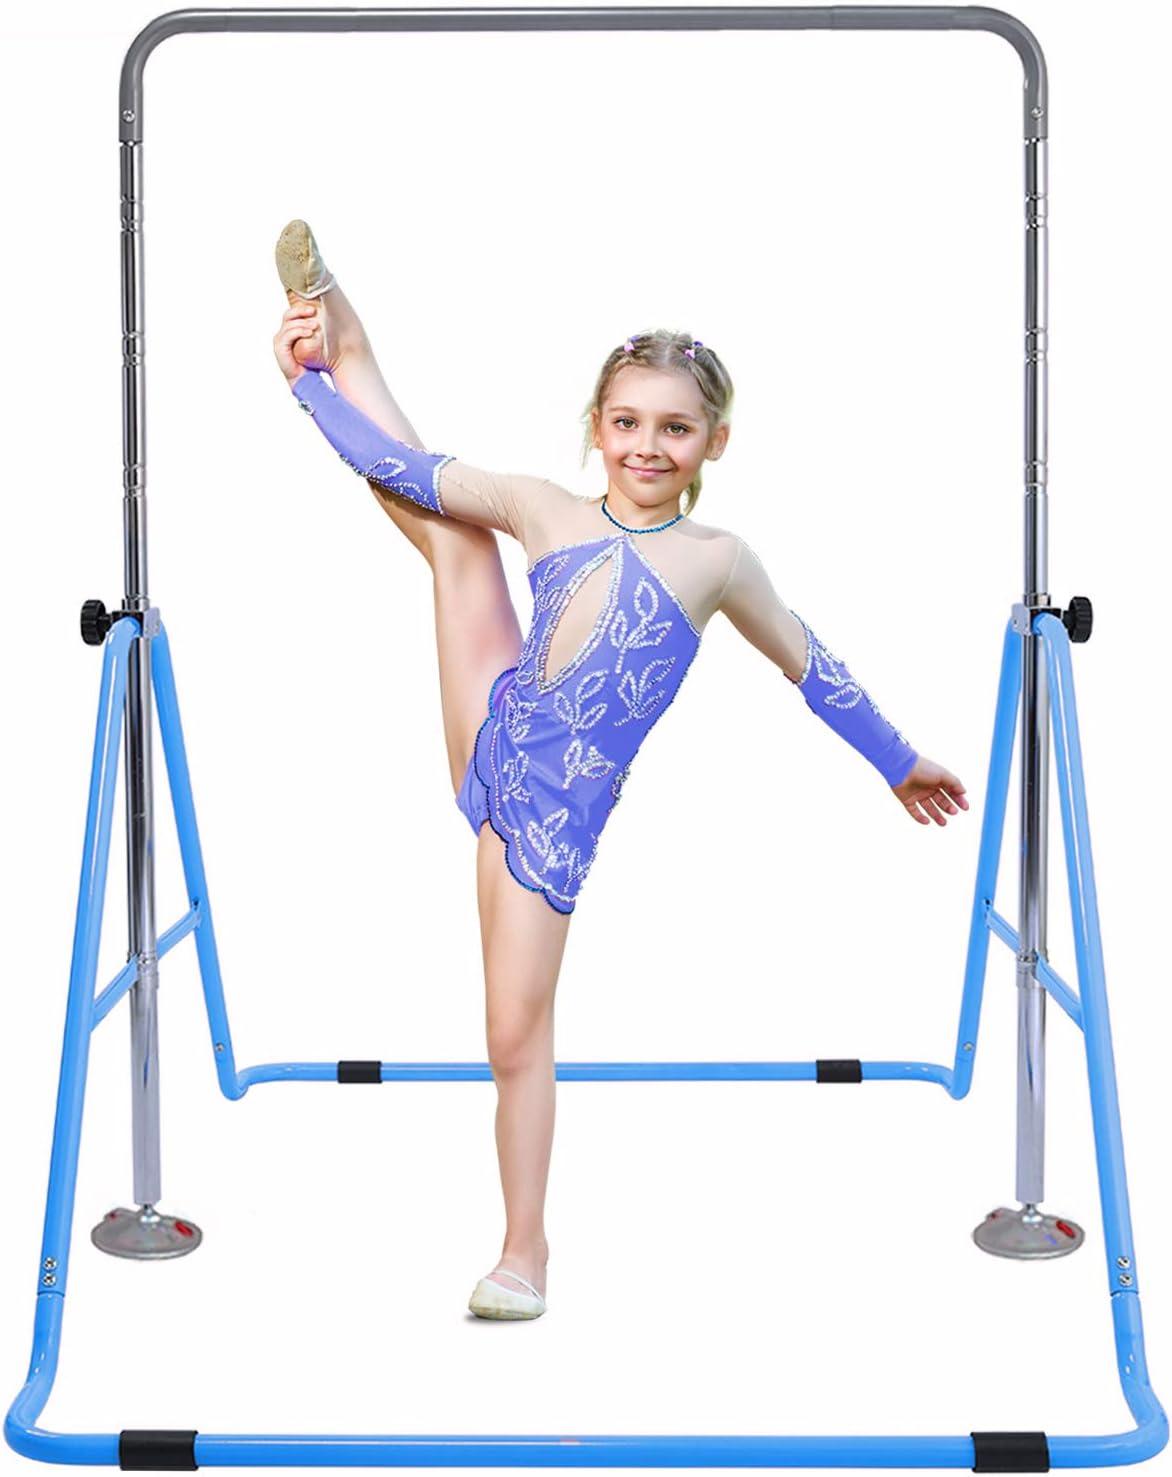 Gymnastics Training Bar for Kids Folding Gymnastic Horizontal Bars with Adjustable Height Boys Girls Practice Bar Gymnastic for Kid Child Junior Training Bar for Home Using